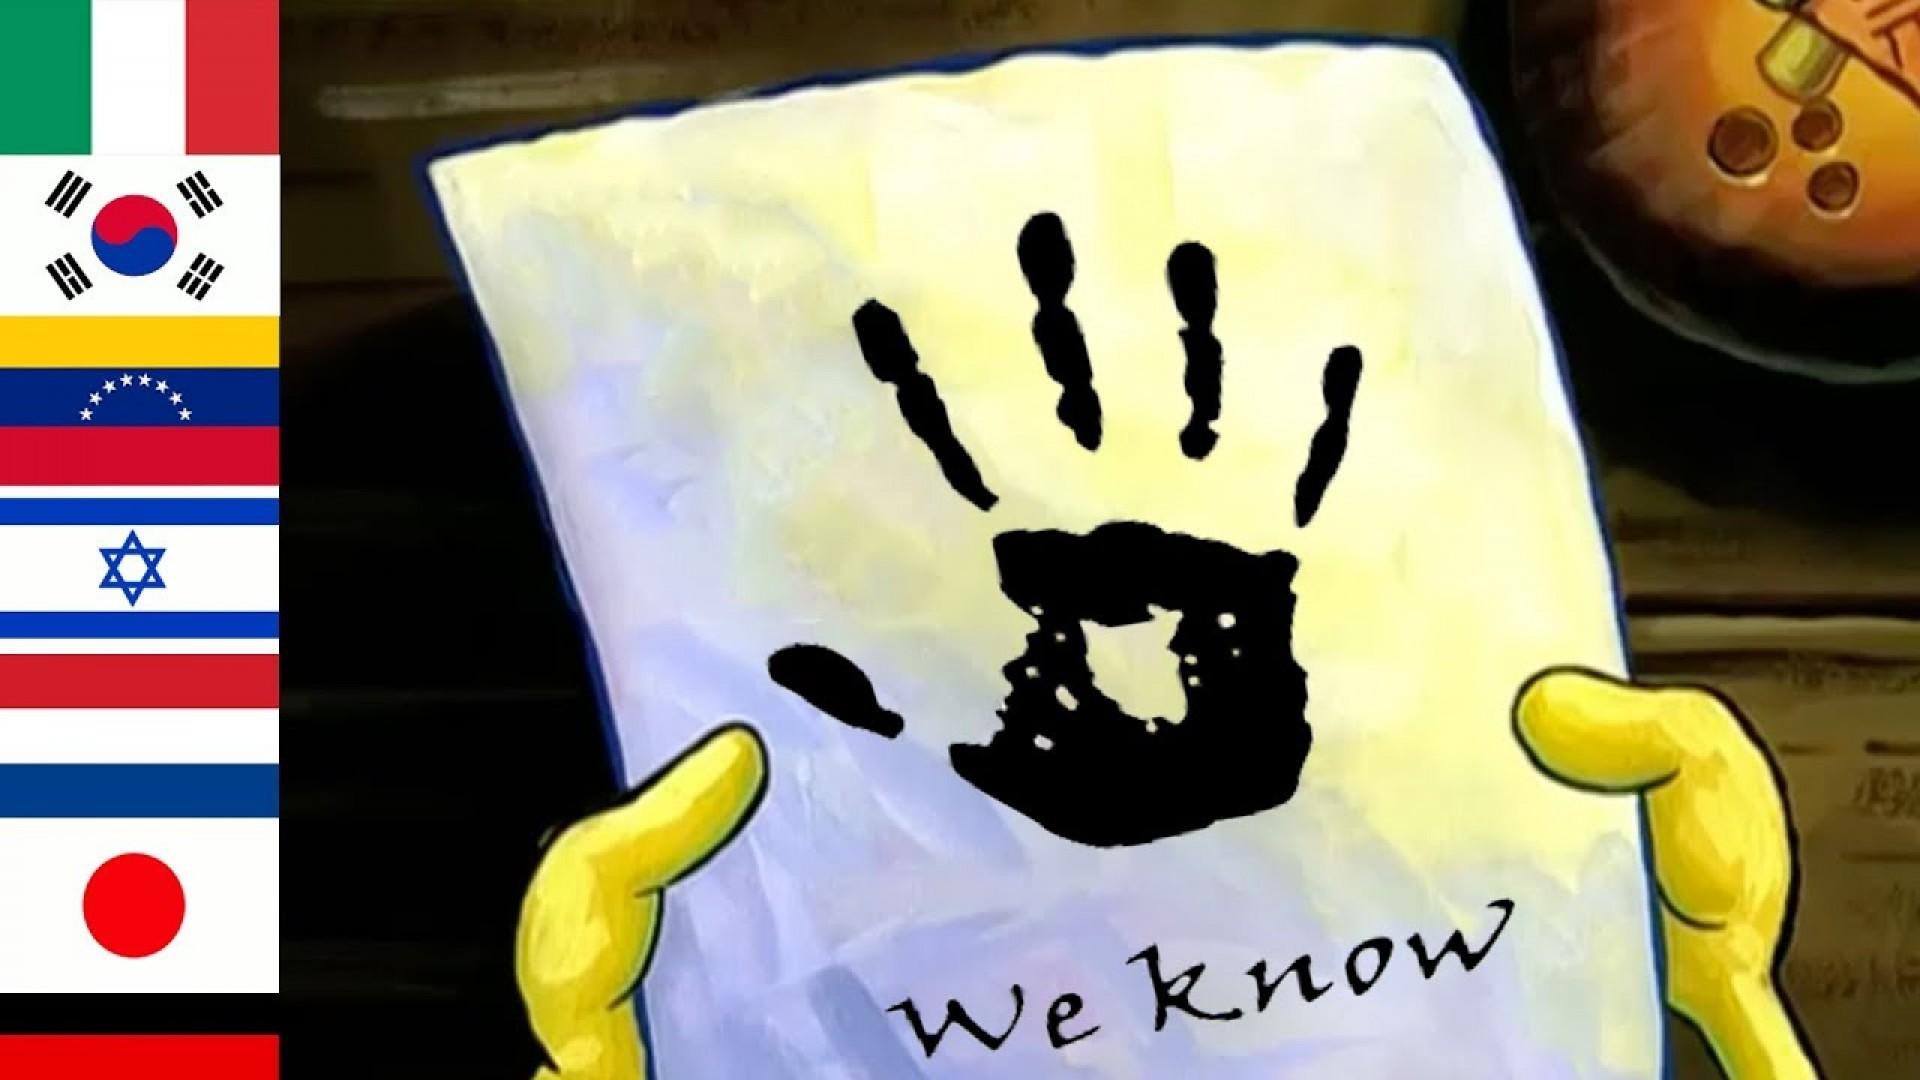 006 Spongebob Essay Meme Maxresdefault Stirring Generator Font 1920